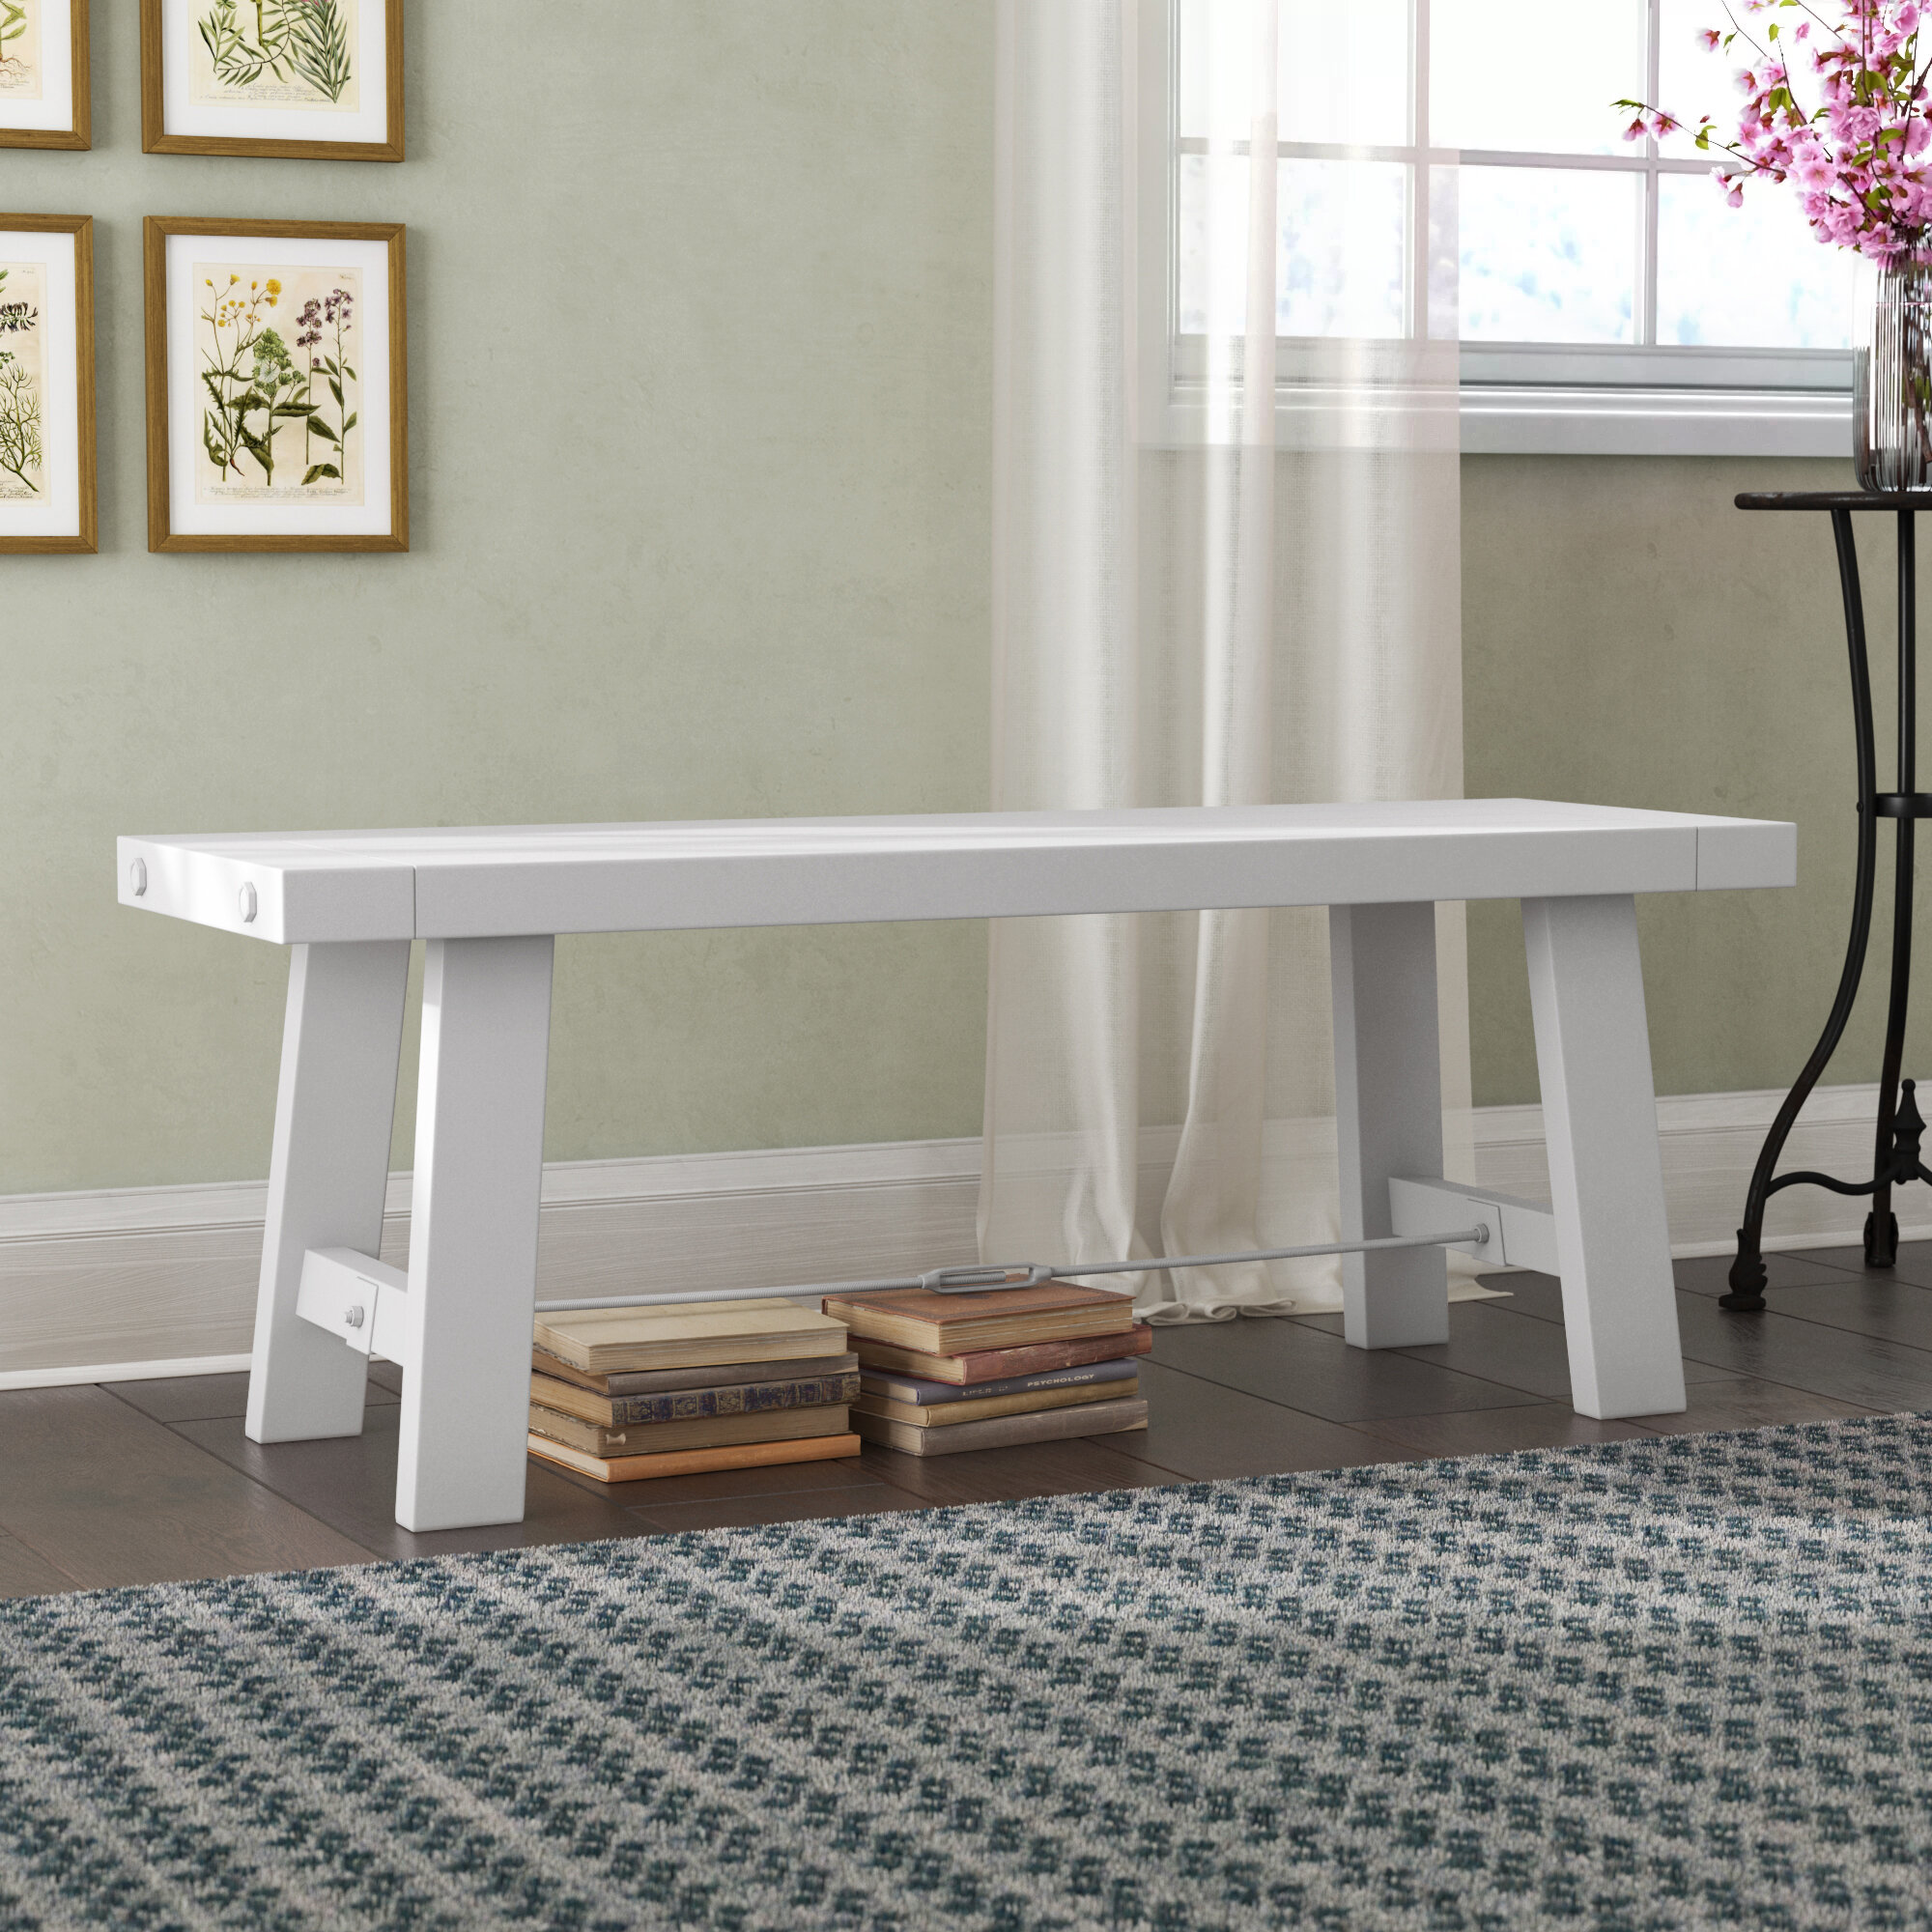 Stupendous Charest Wood Bench Machost Co Dining Chair Design Ideas Machostcouk